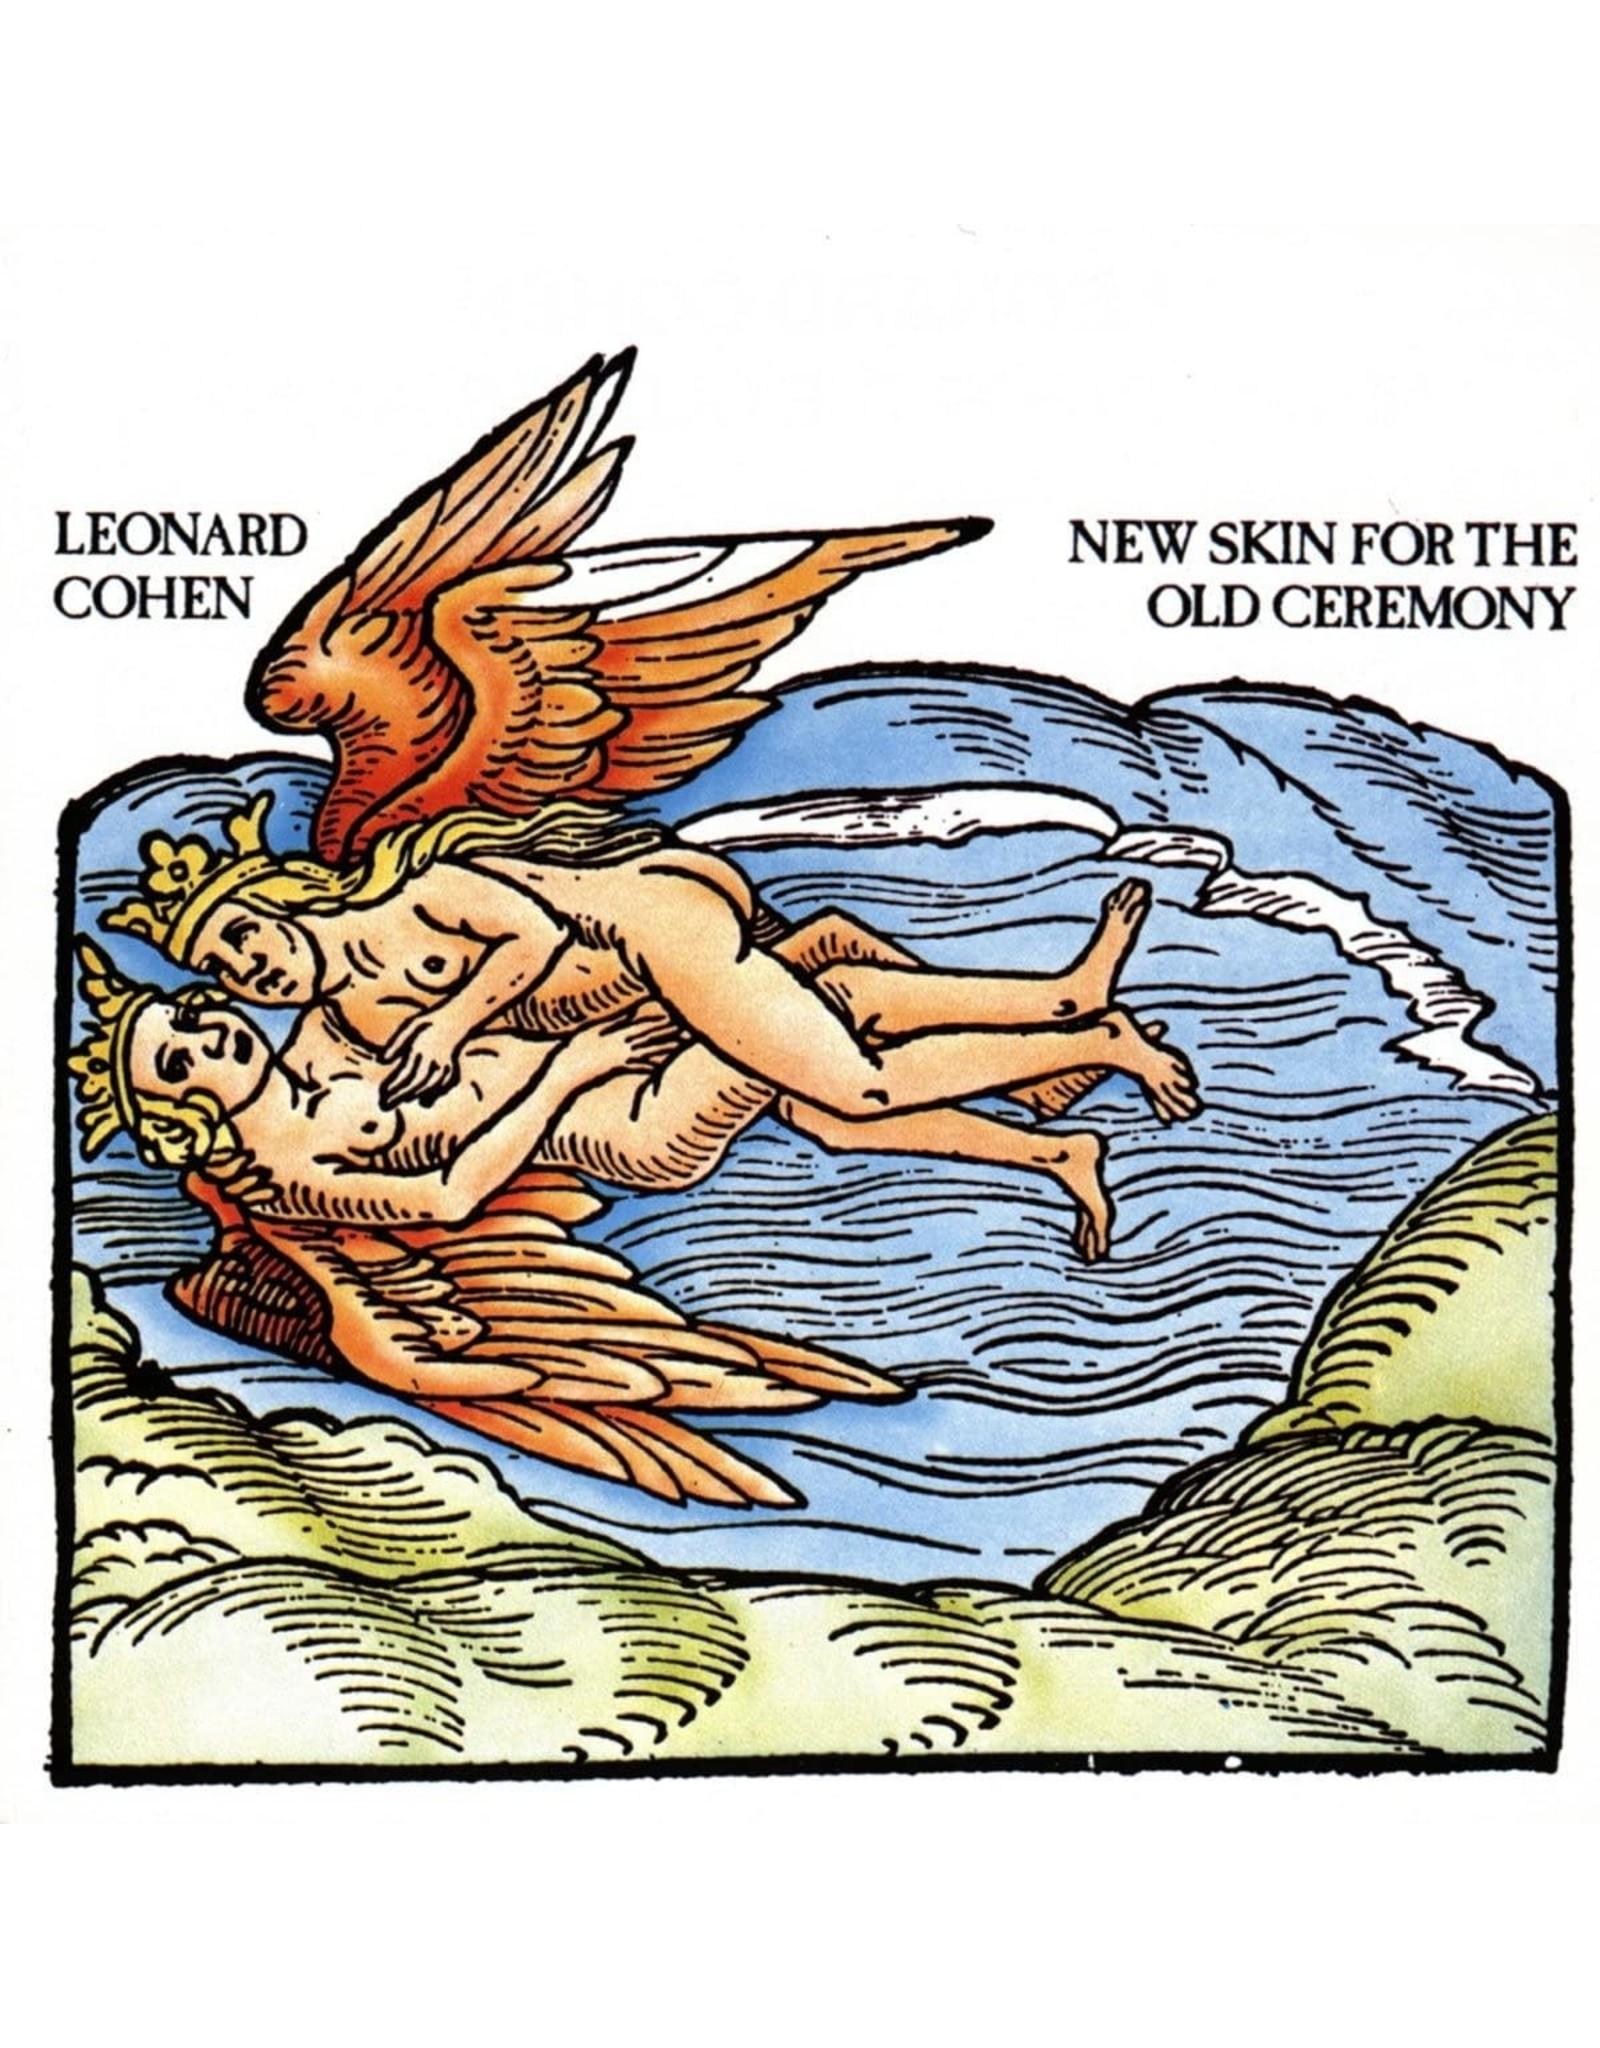 Leonard Cohen - New Skin For Old Ceremony